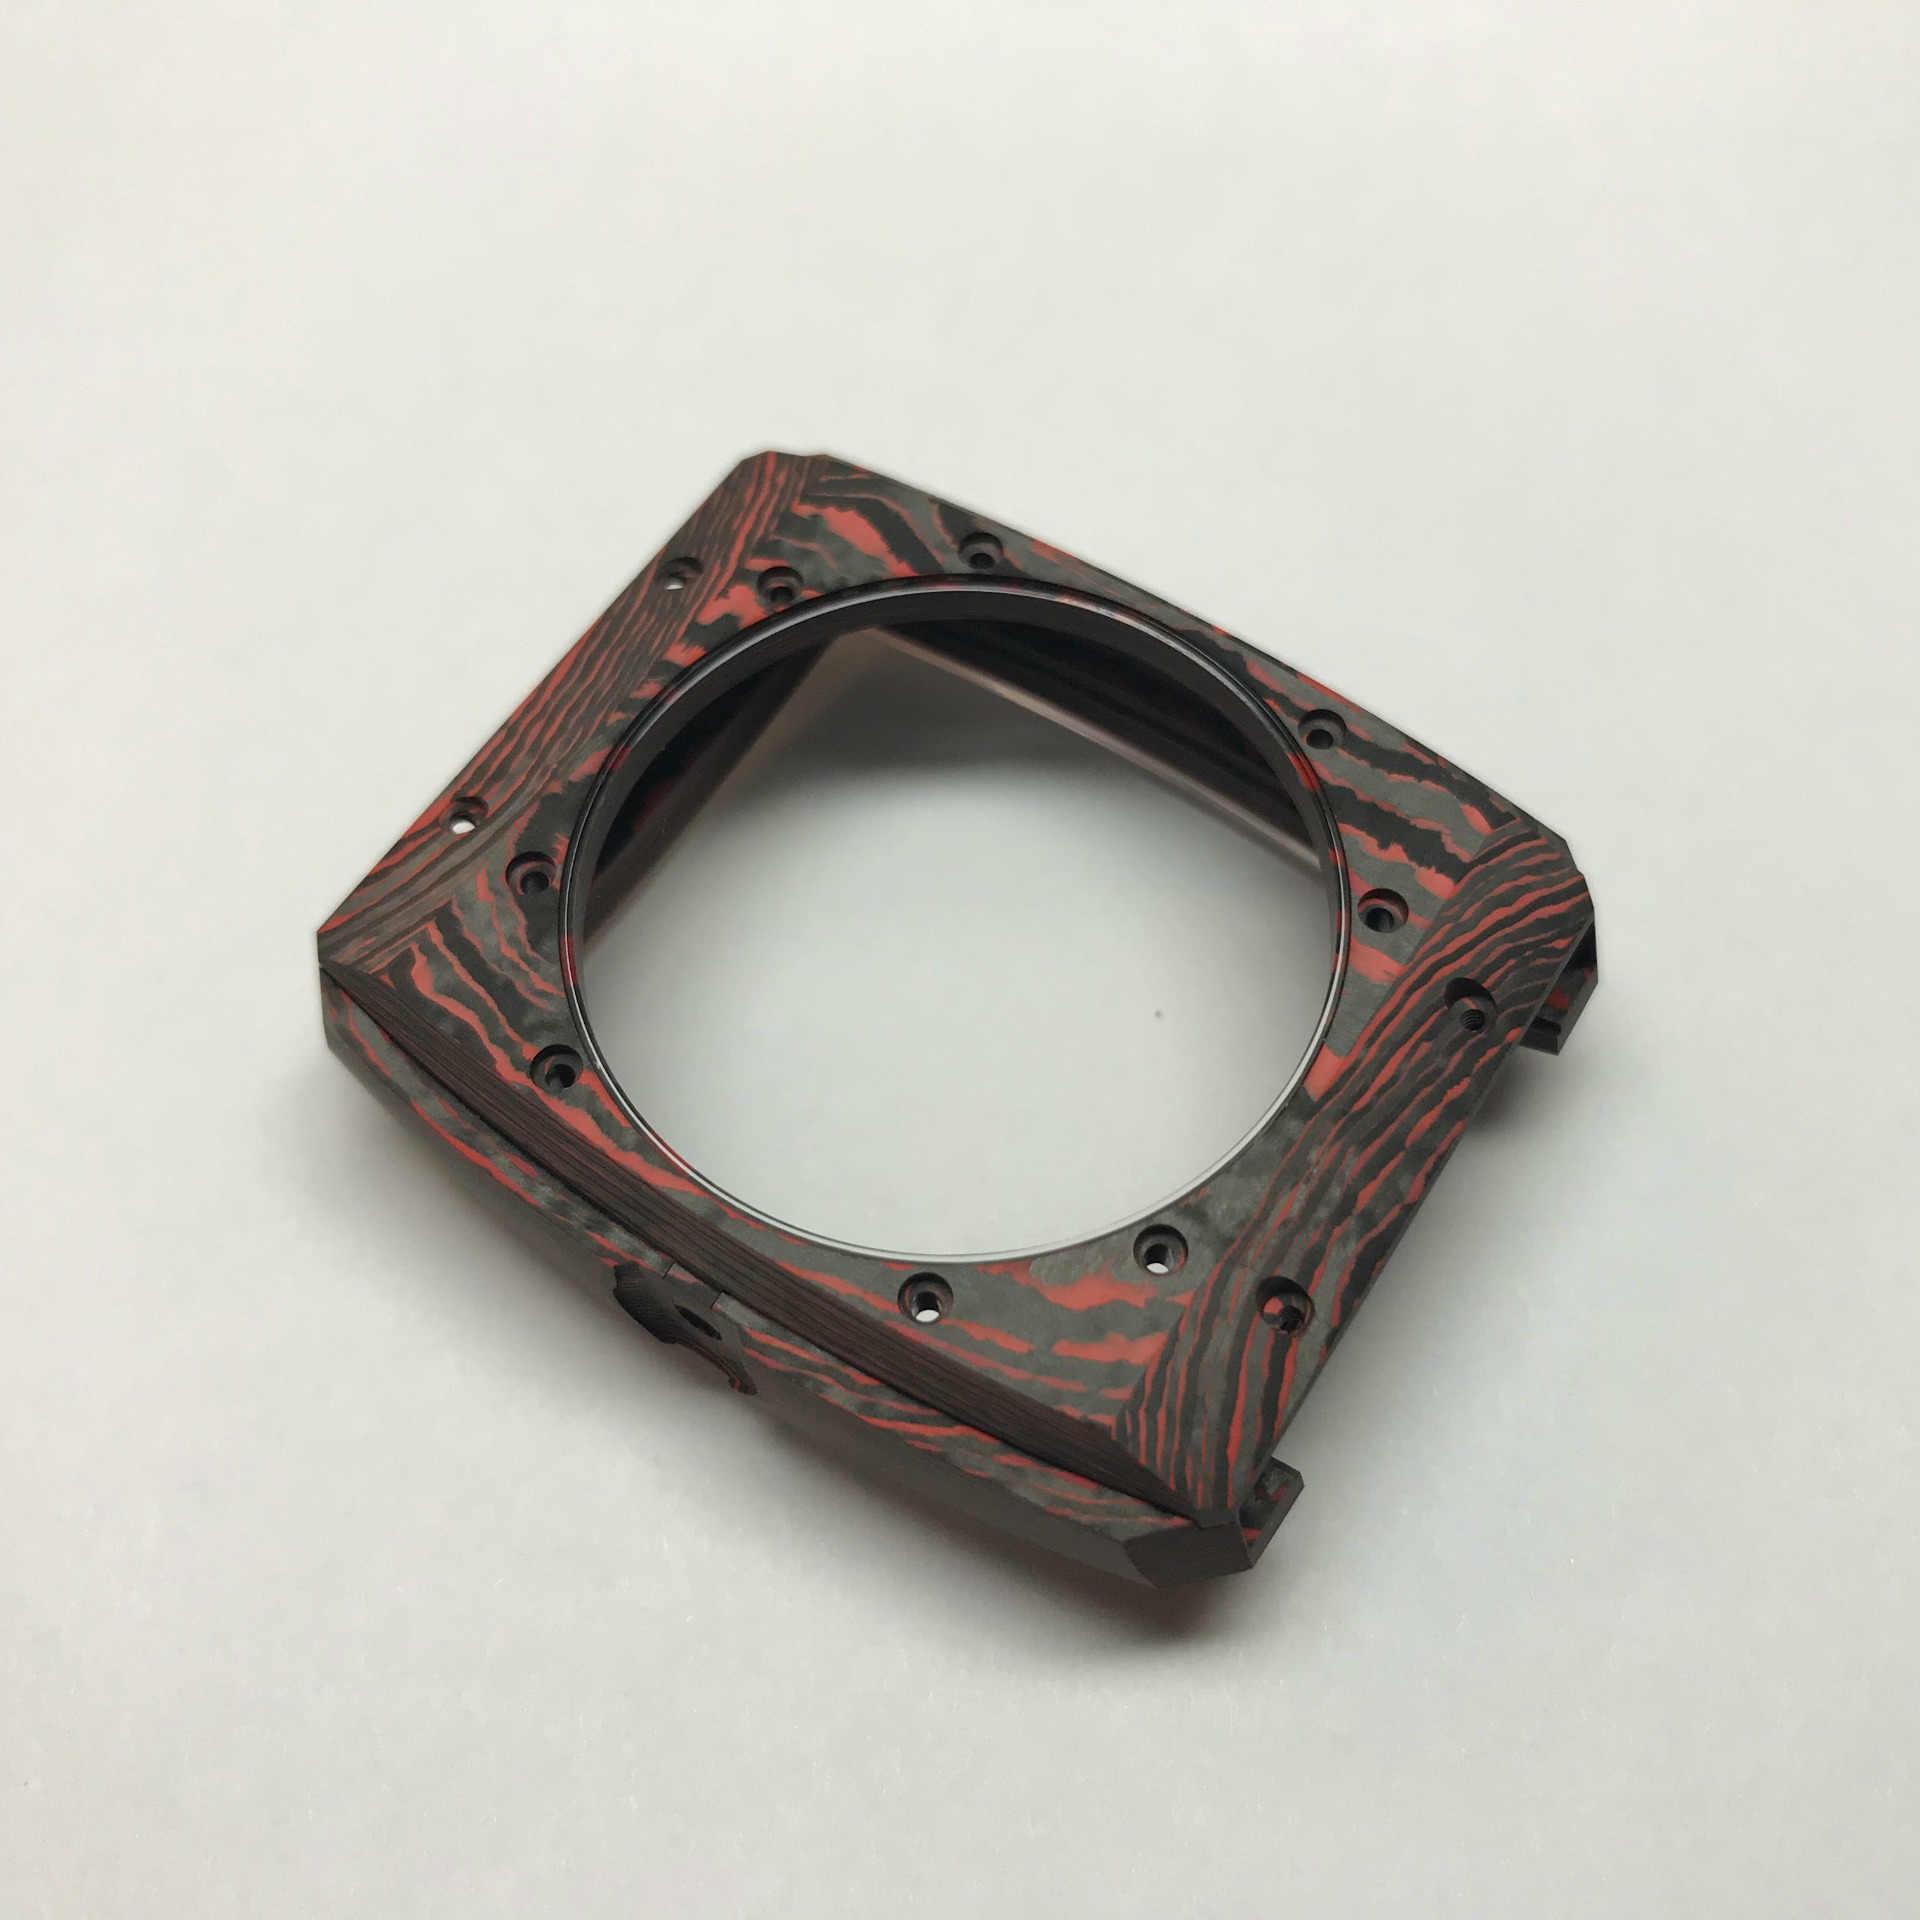 Vault Swiss carbon and ceramic watch case